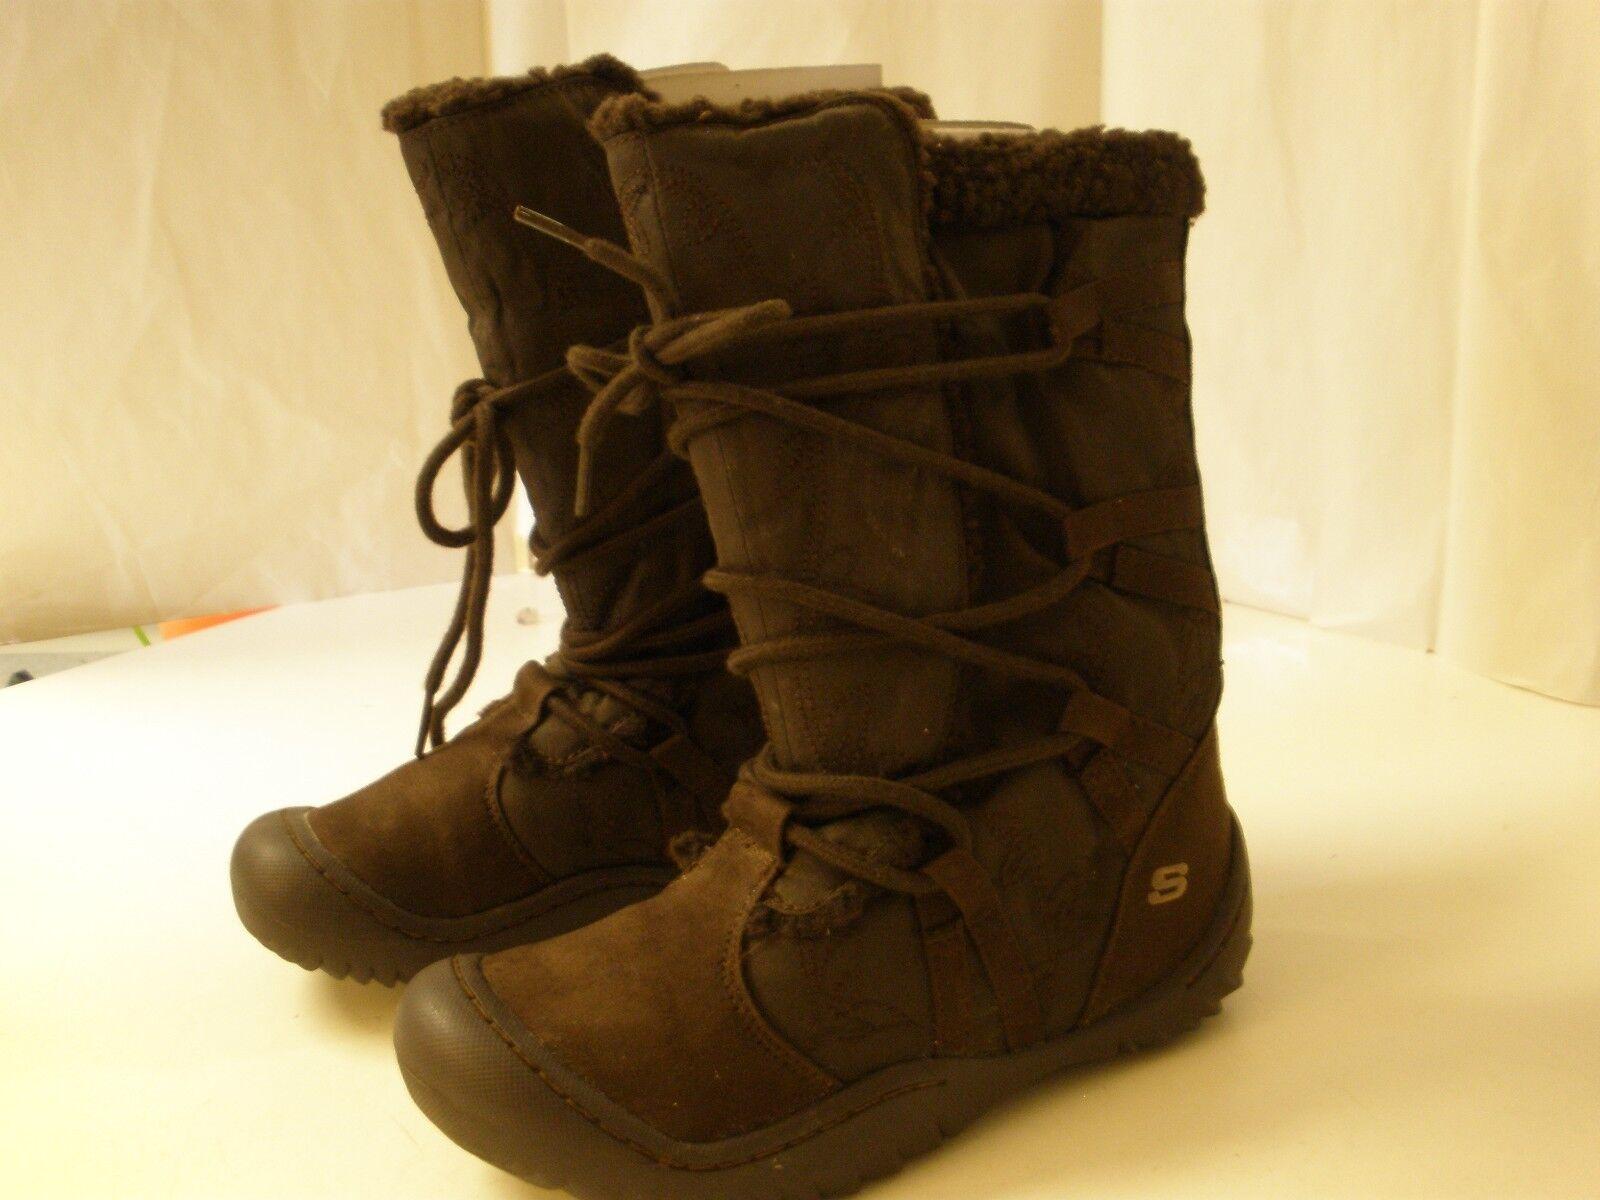 Skechers Chocolate Brown Suede Look Boot 6 B New Lined Tie